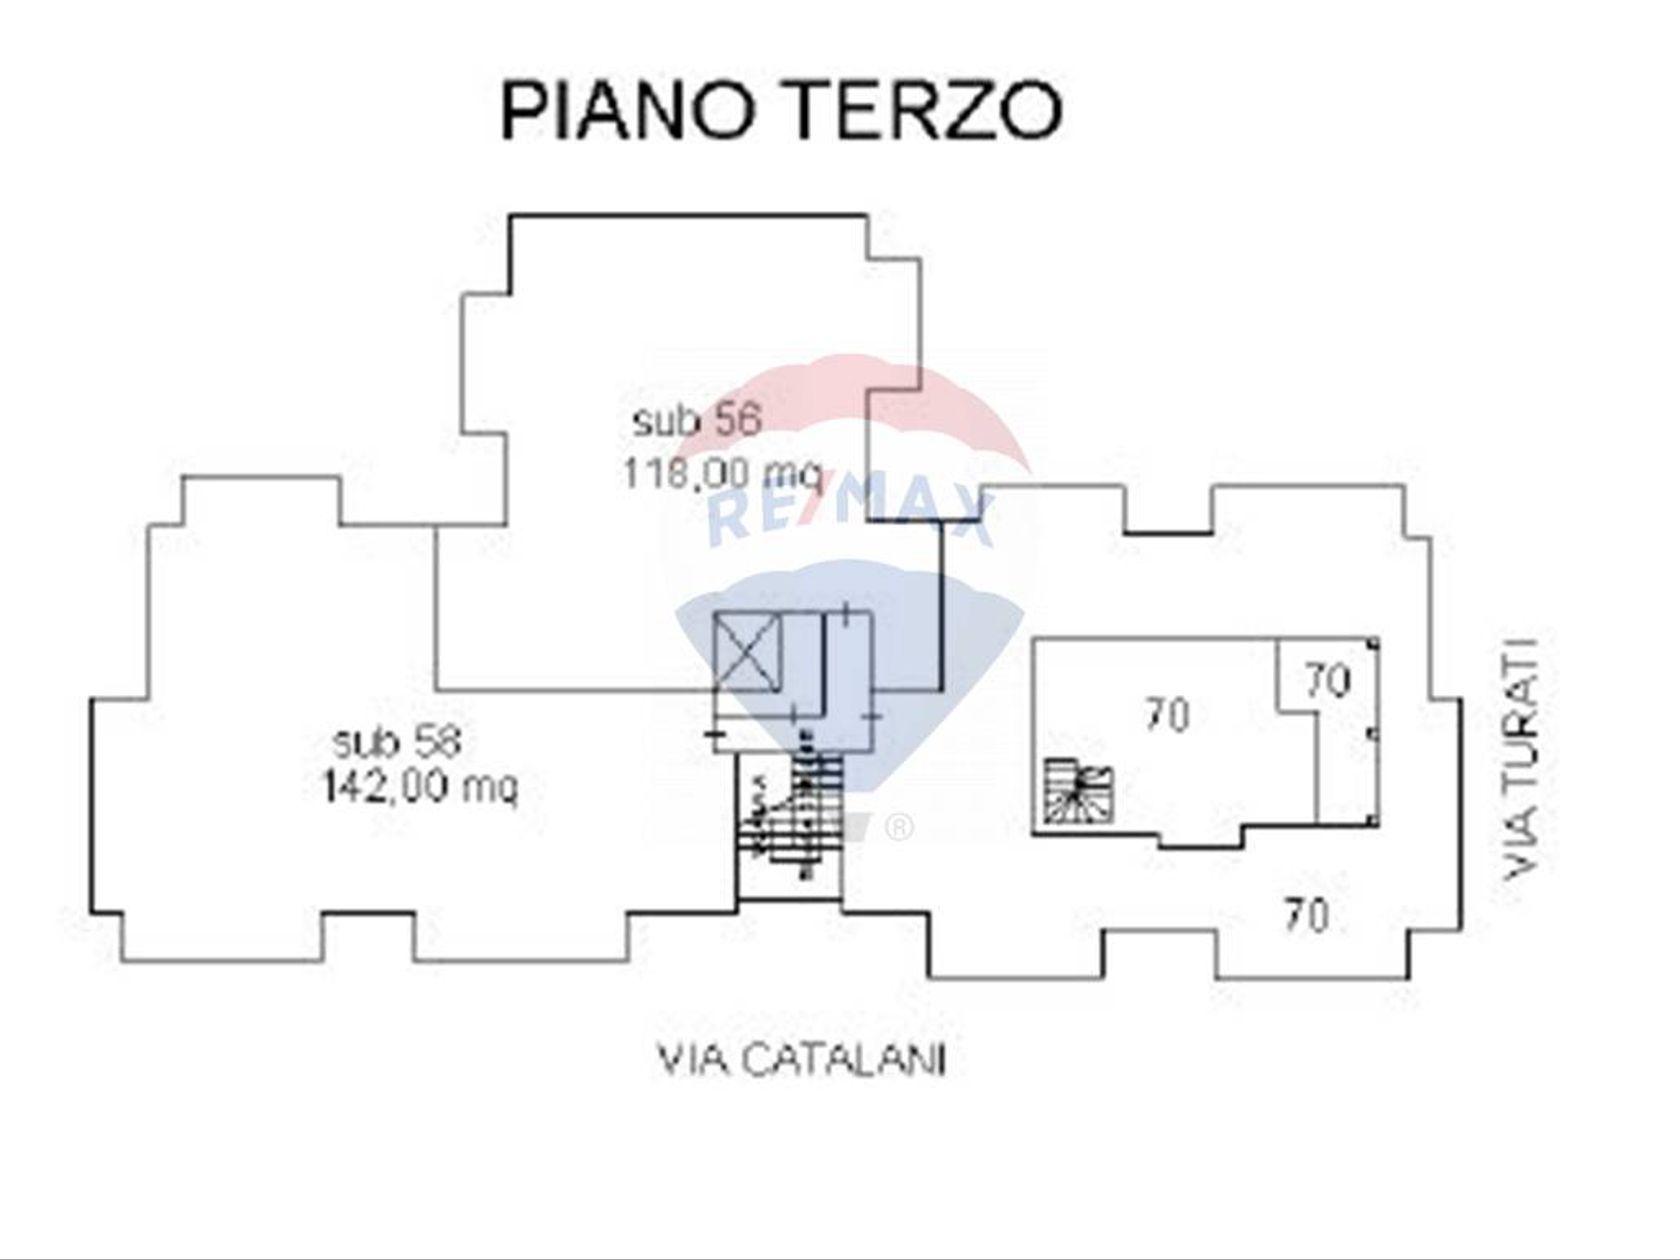 Altro Zona Centro, Quartu Sant'Elena, CA Vendita - Planimetria 1